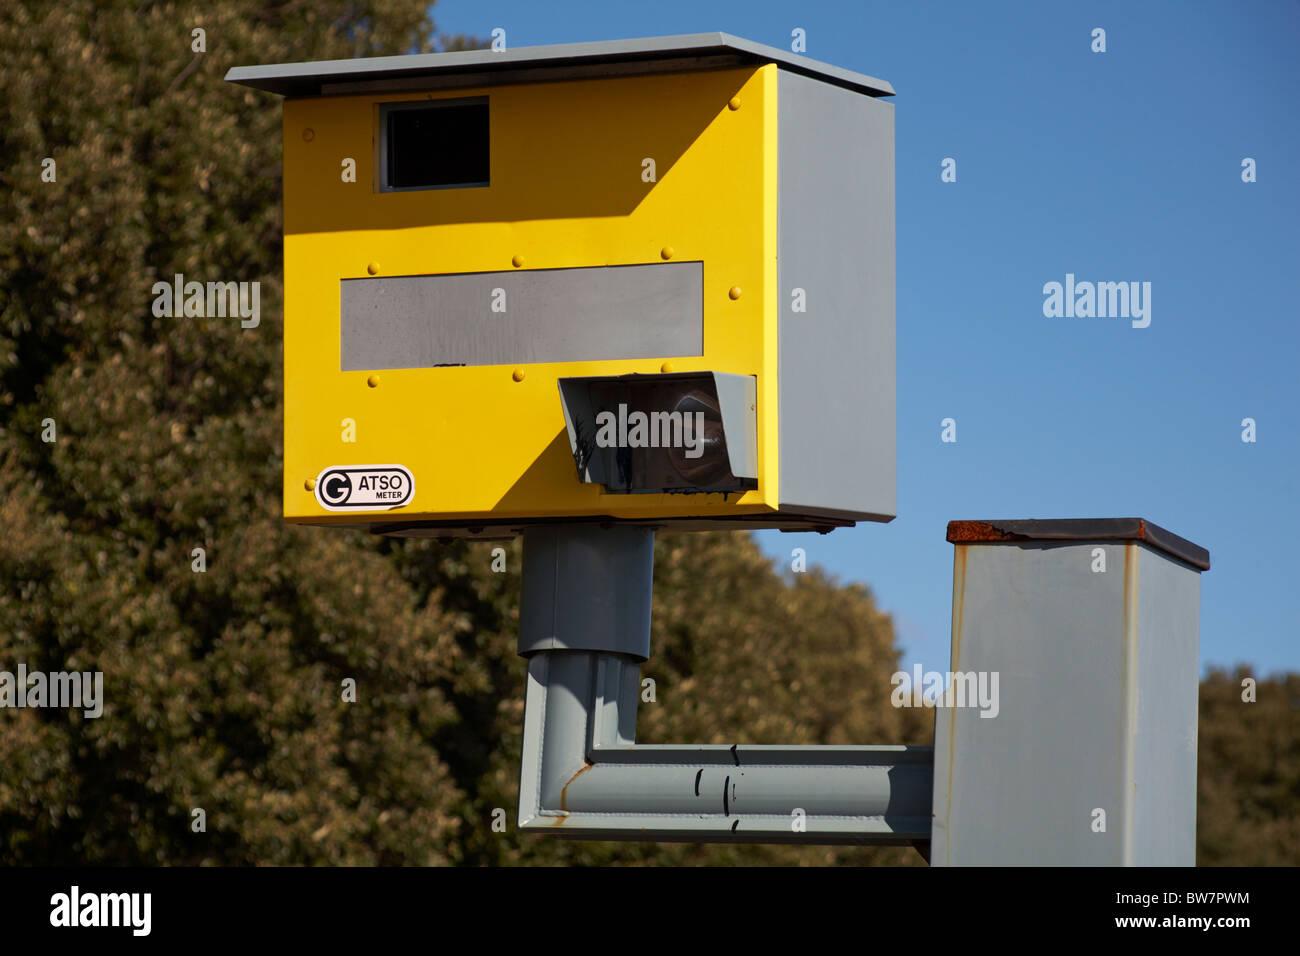 http://c8.alamy.com/comp/BW7PWM/gatso-meter-speed-camera-BW7PWM.jpg